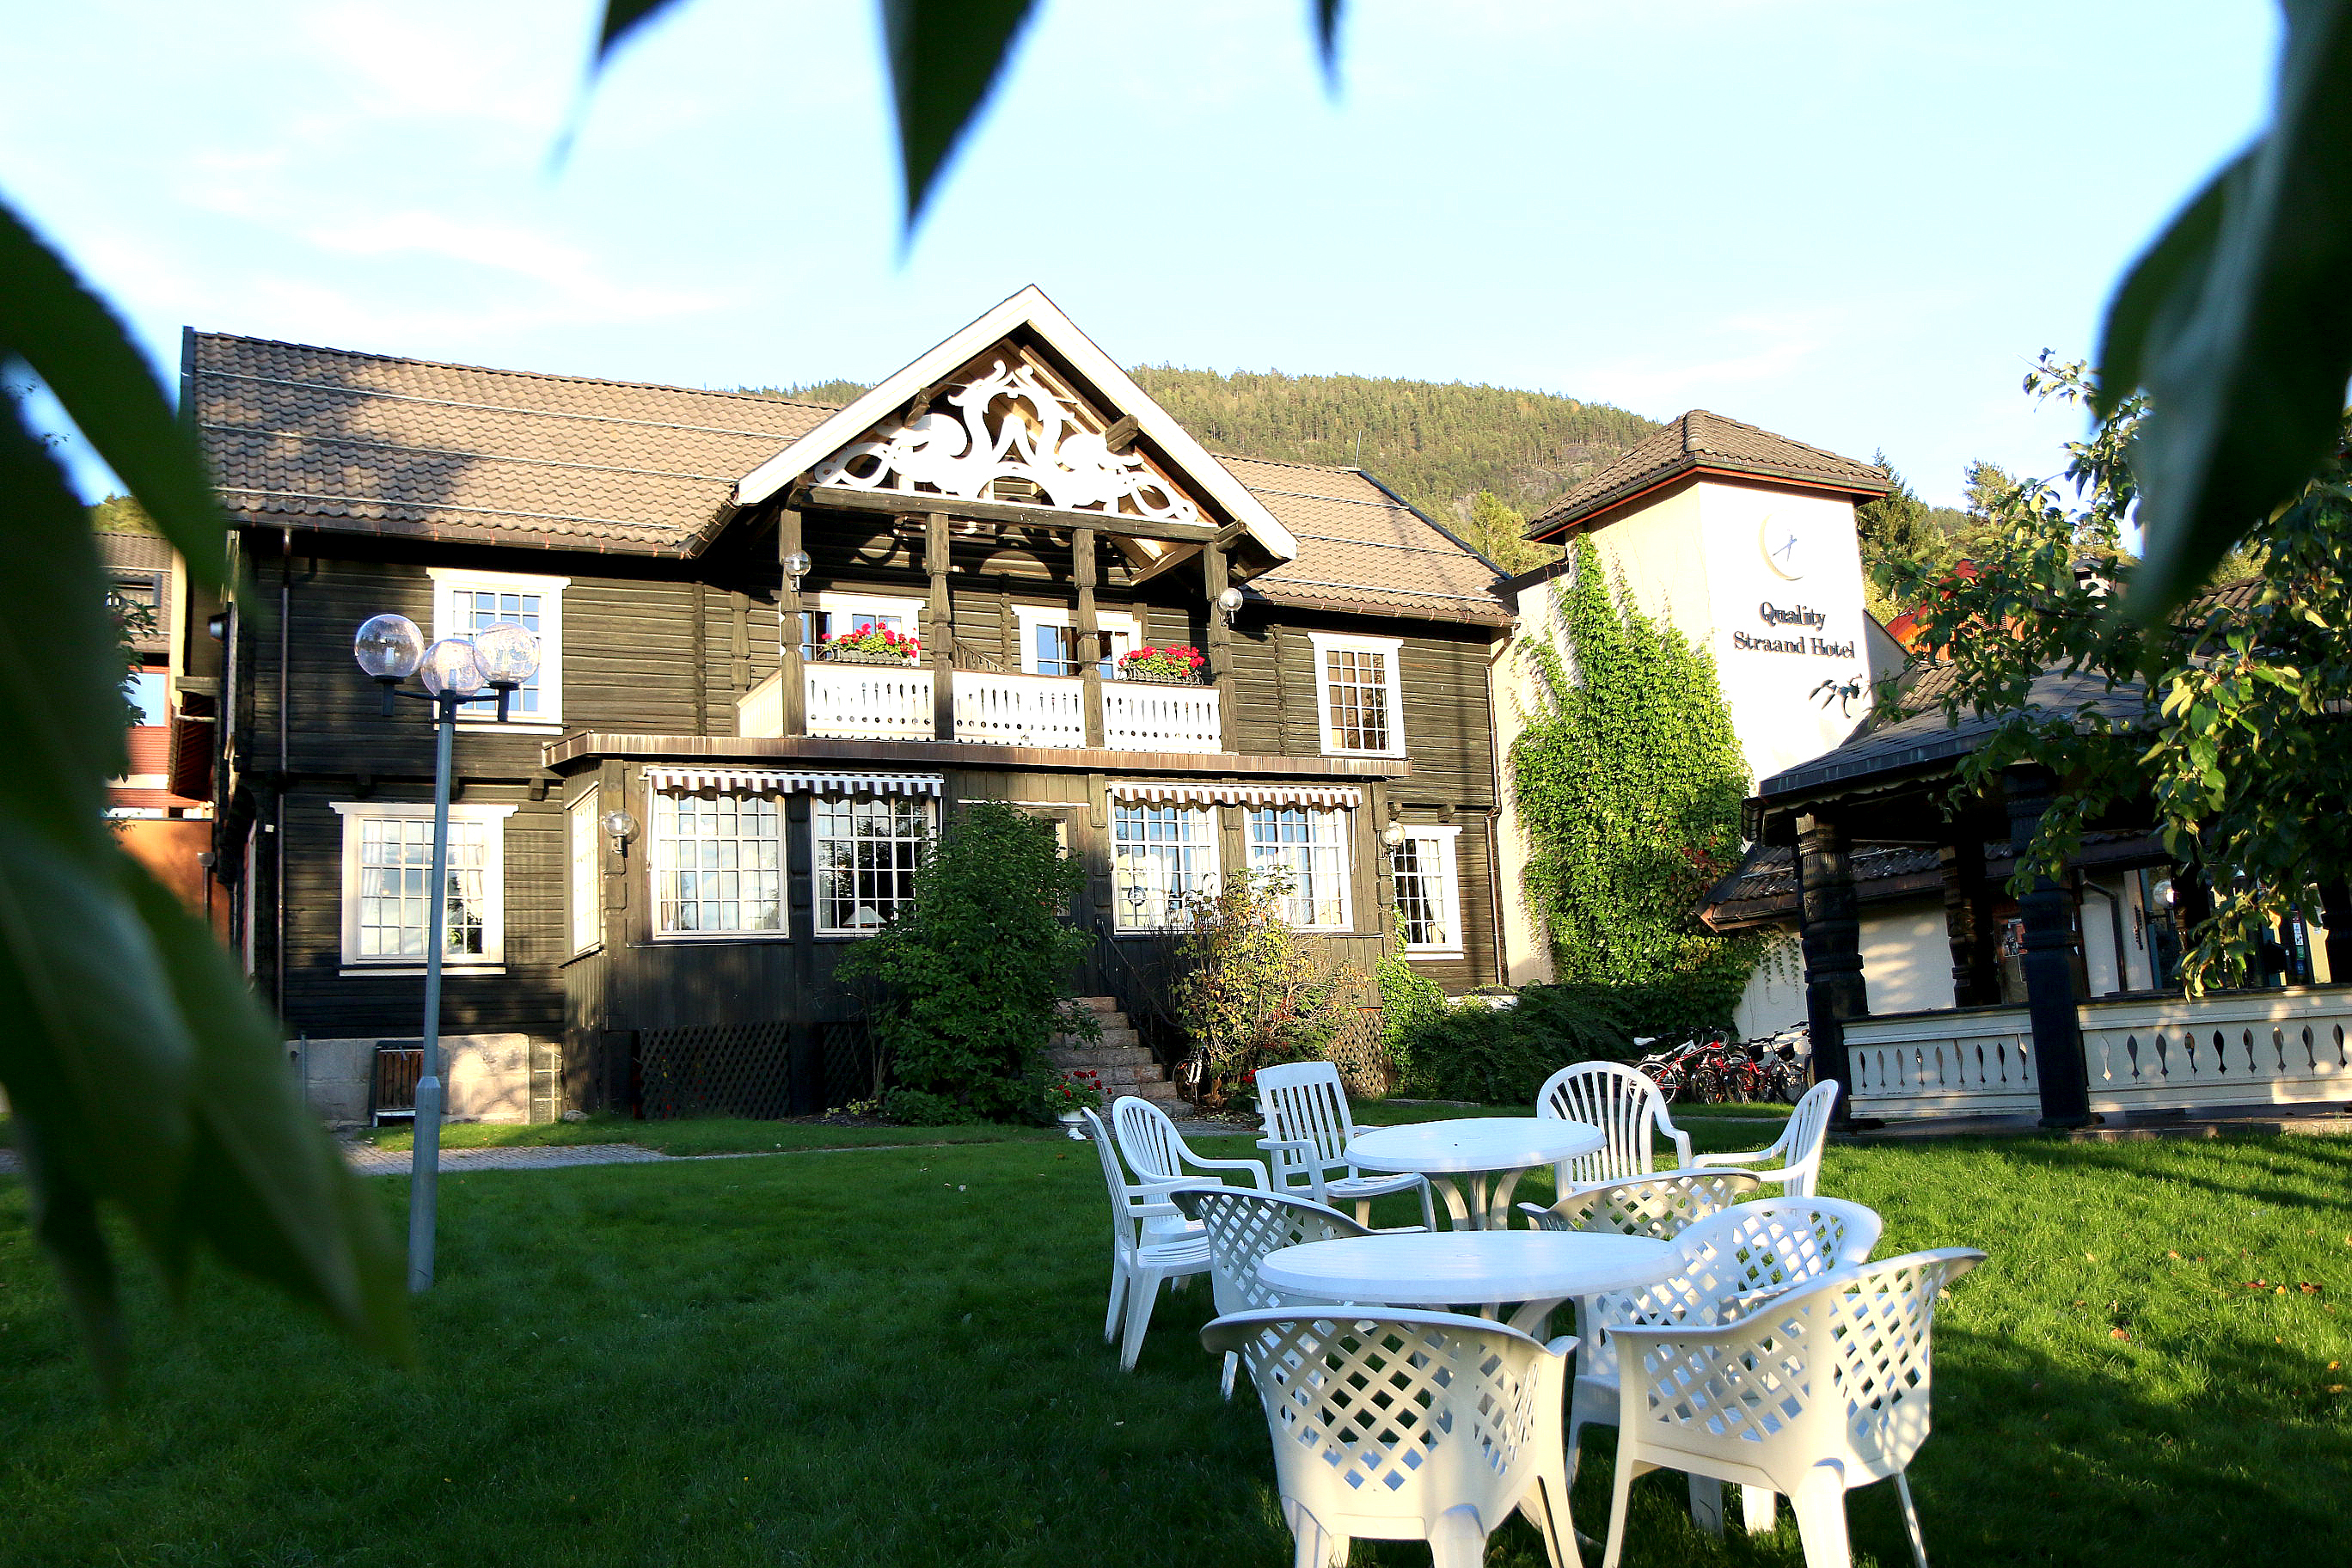 Quality Straand Hotel Foto: Flemming H. Tveitan/Fjord Line